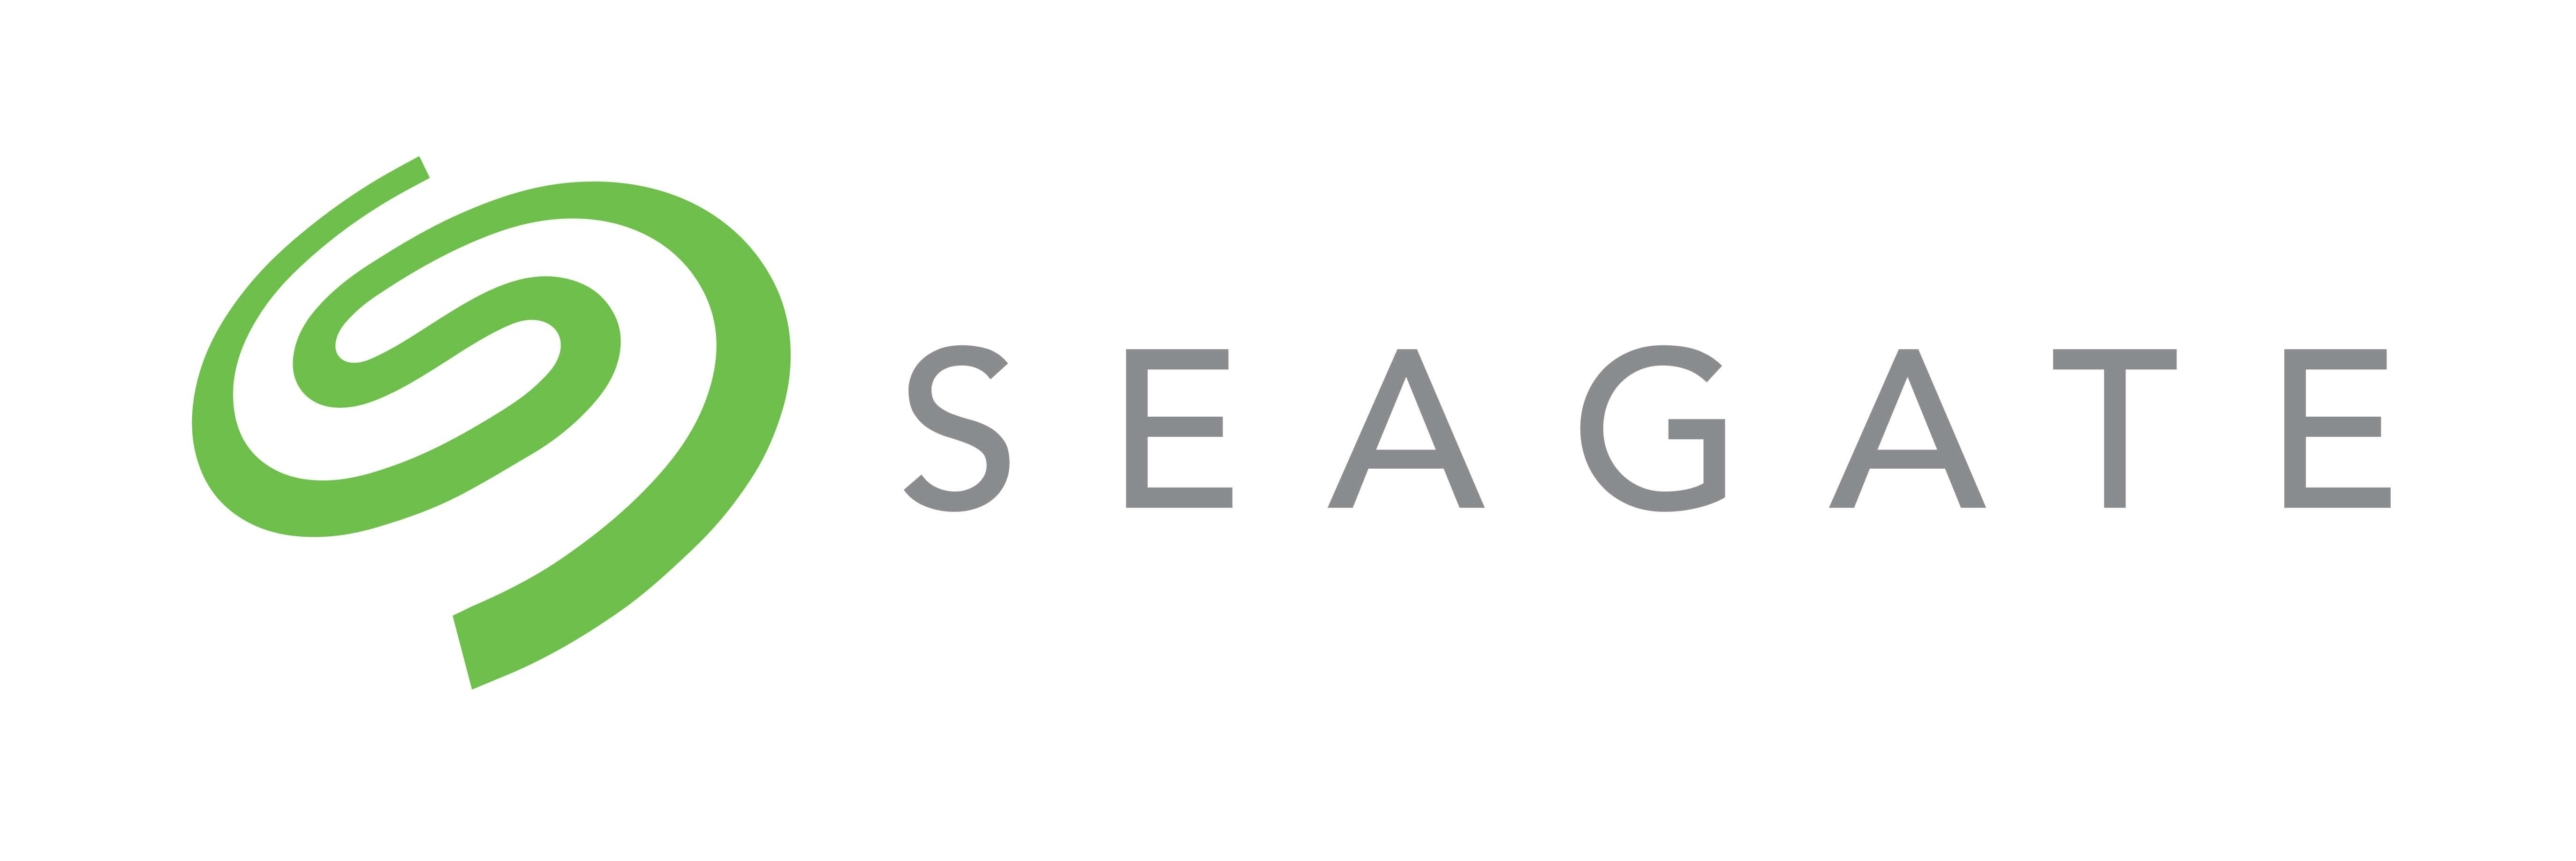 باکس تبدیل هارد 2.5 اینچ سیگیت Seagate expansion SSD/HDD 2.5 inch